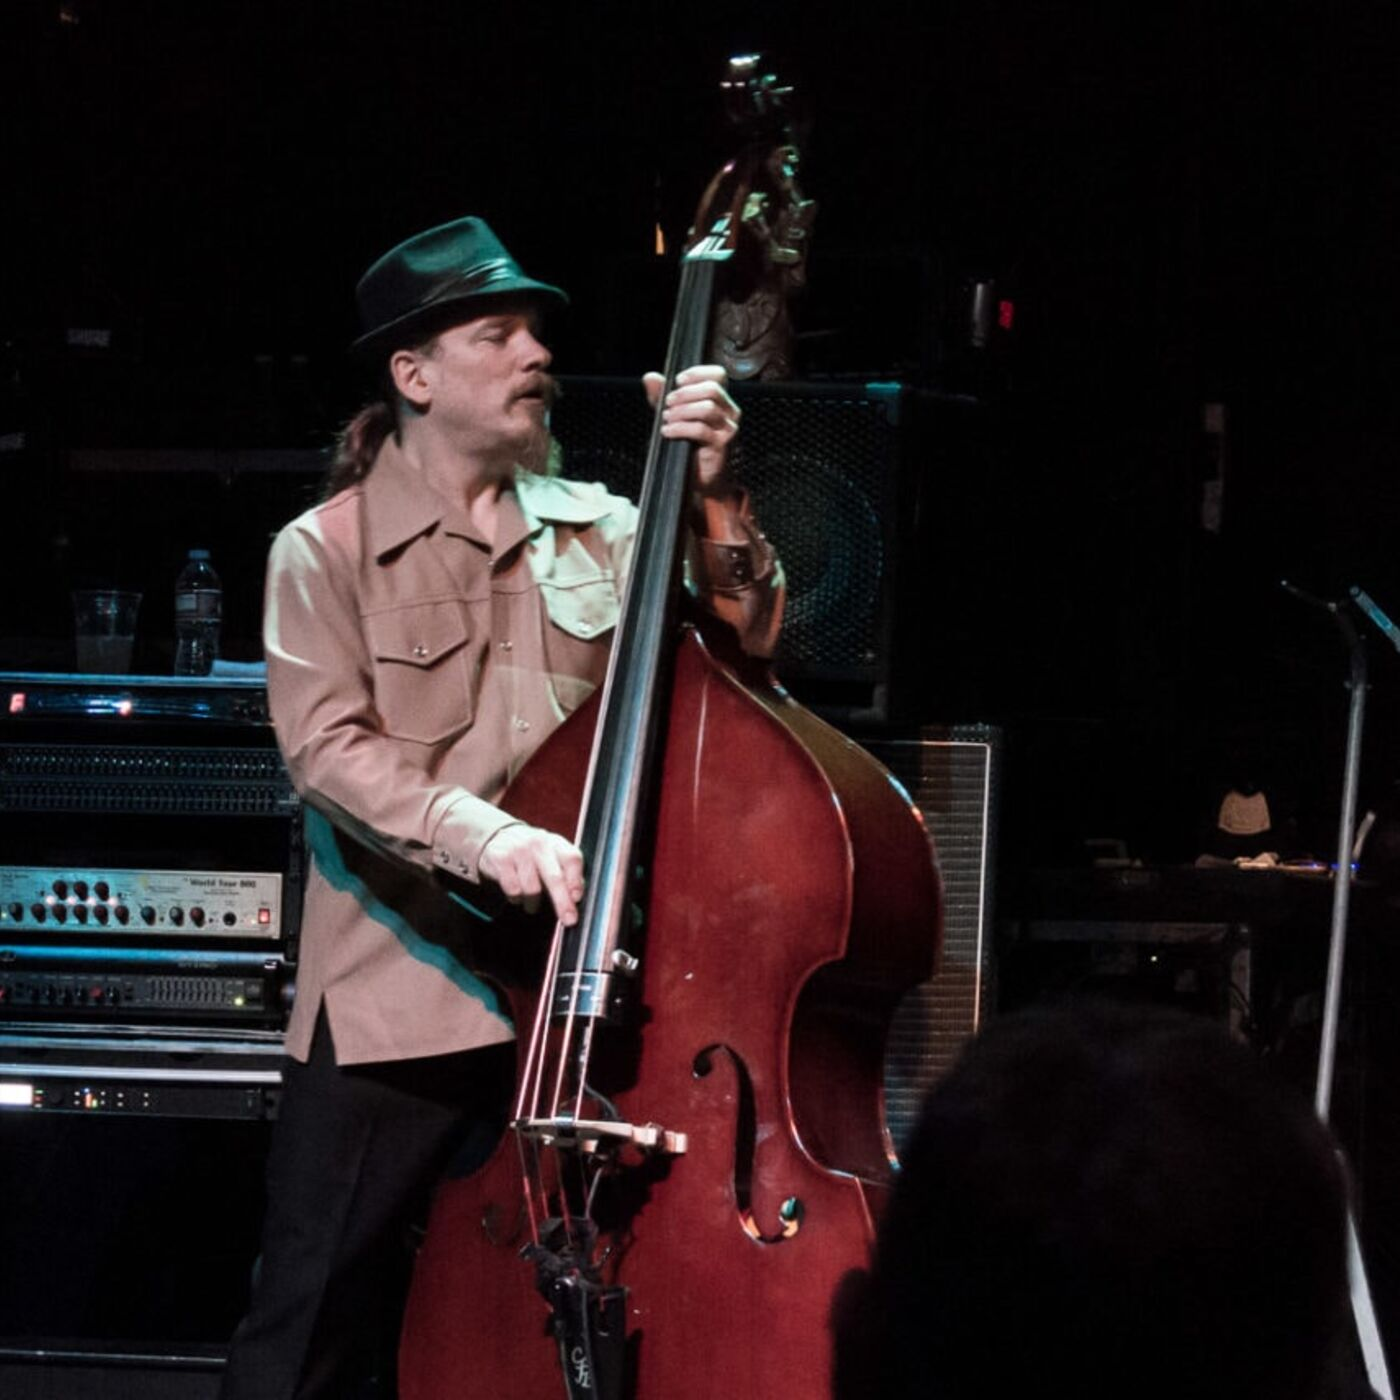 Jim Prescott - AKA Jimi Jazz of G Love and Special Sauce (part 2)